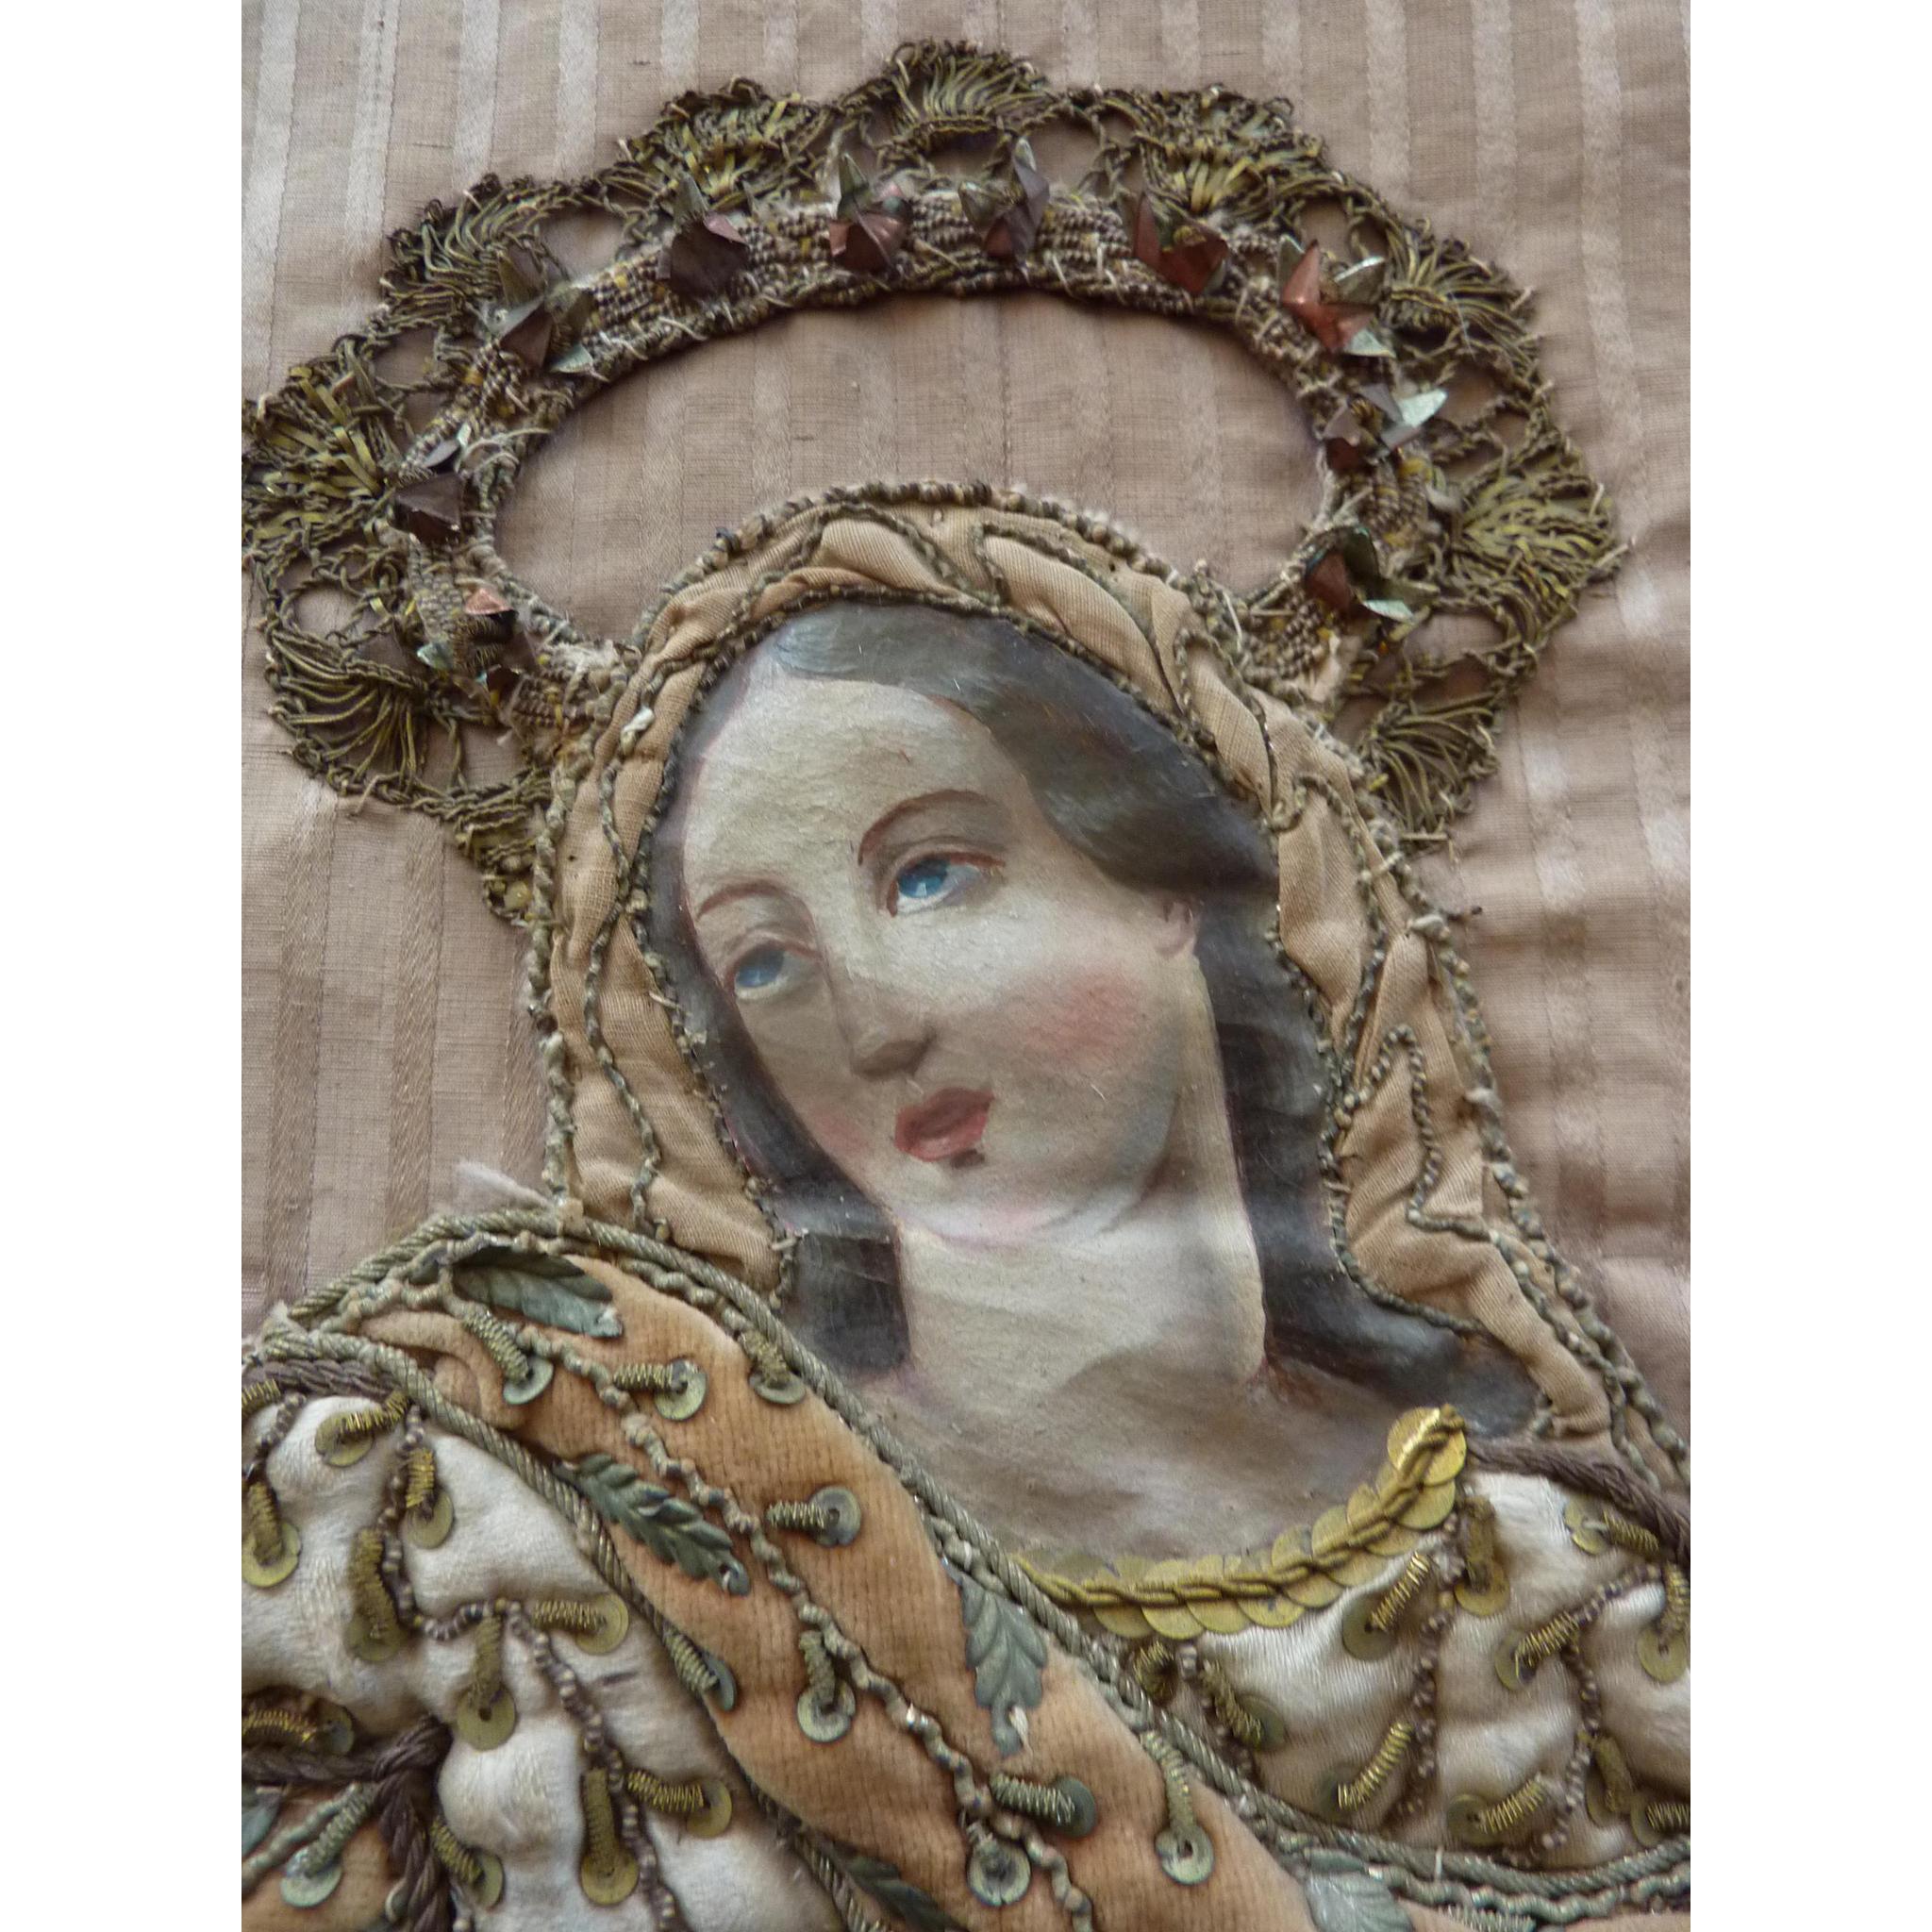 Antique French religious textile panel Assumption Virgin Mary heaven ...